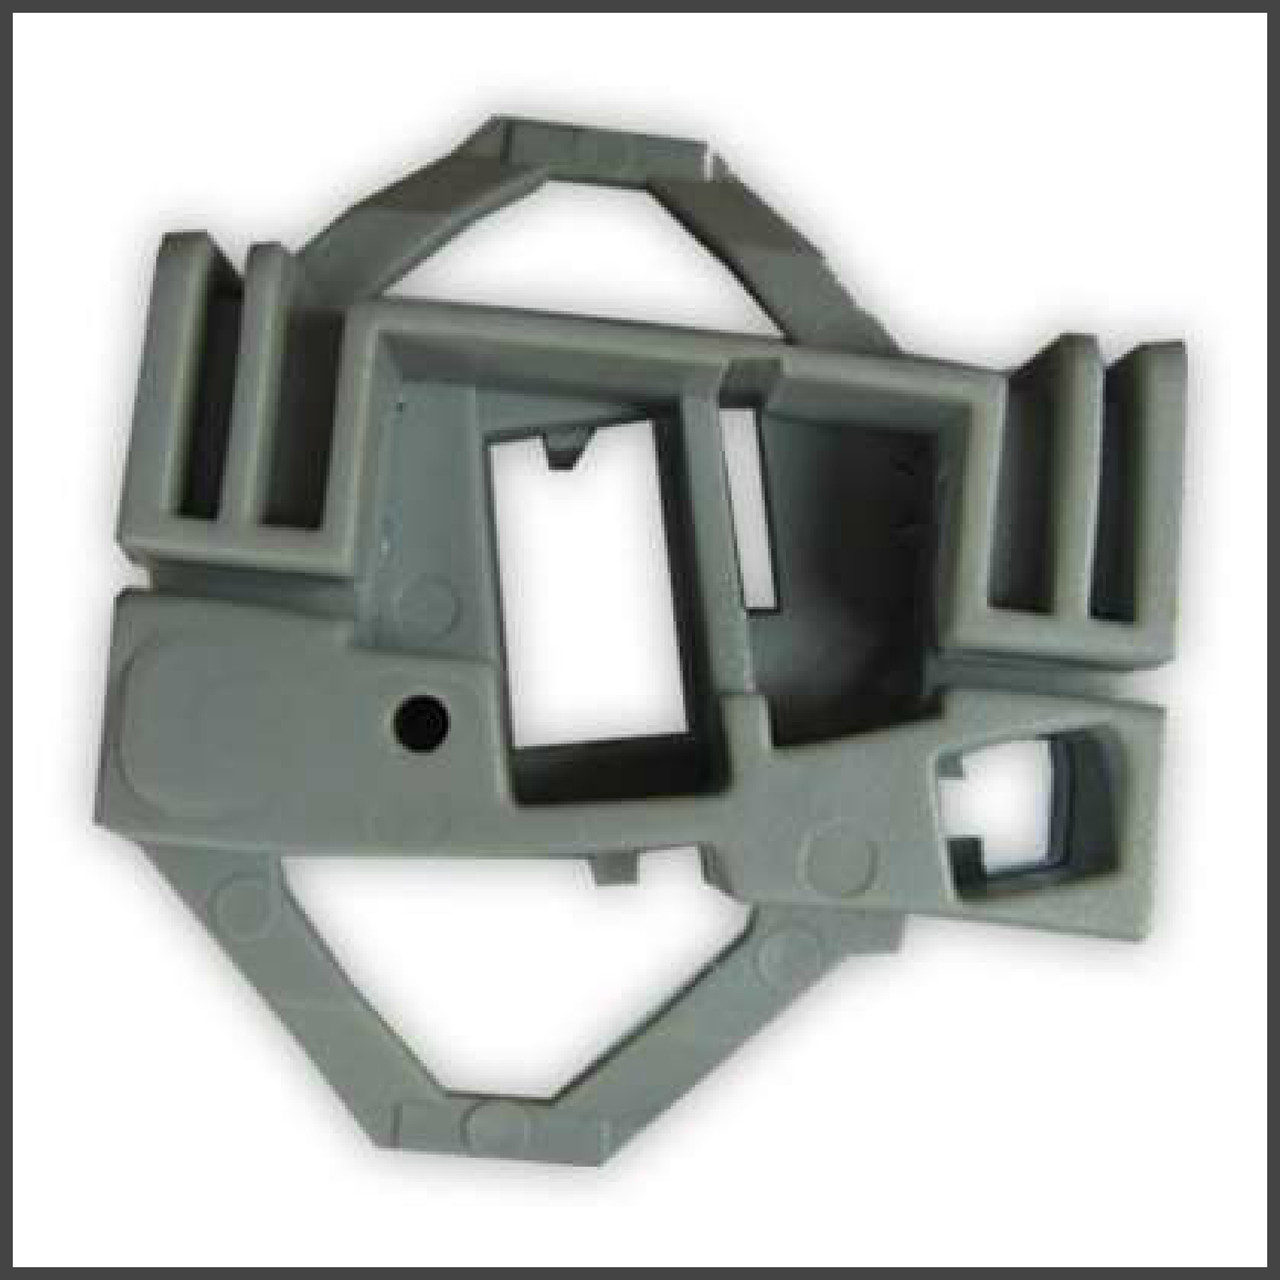 Механізм склопідіймача фіксатор скріпка передні праві двері Seat, Skoda, Volkswagen (Front R)